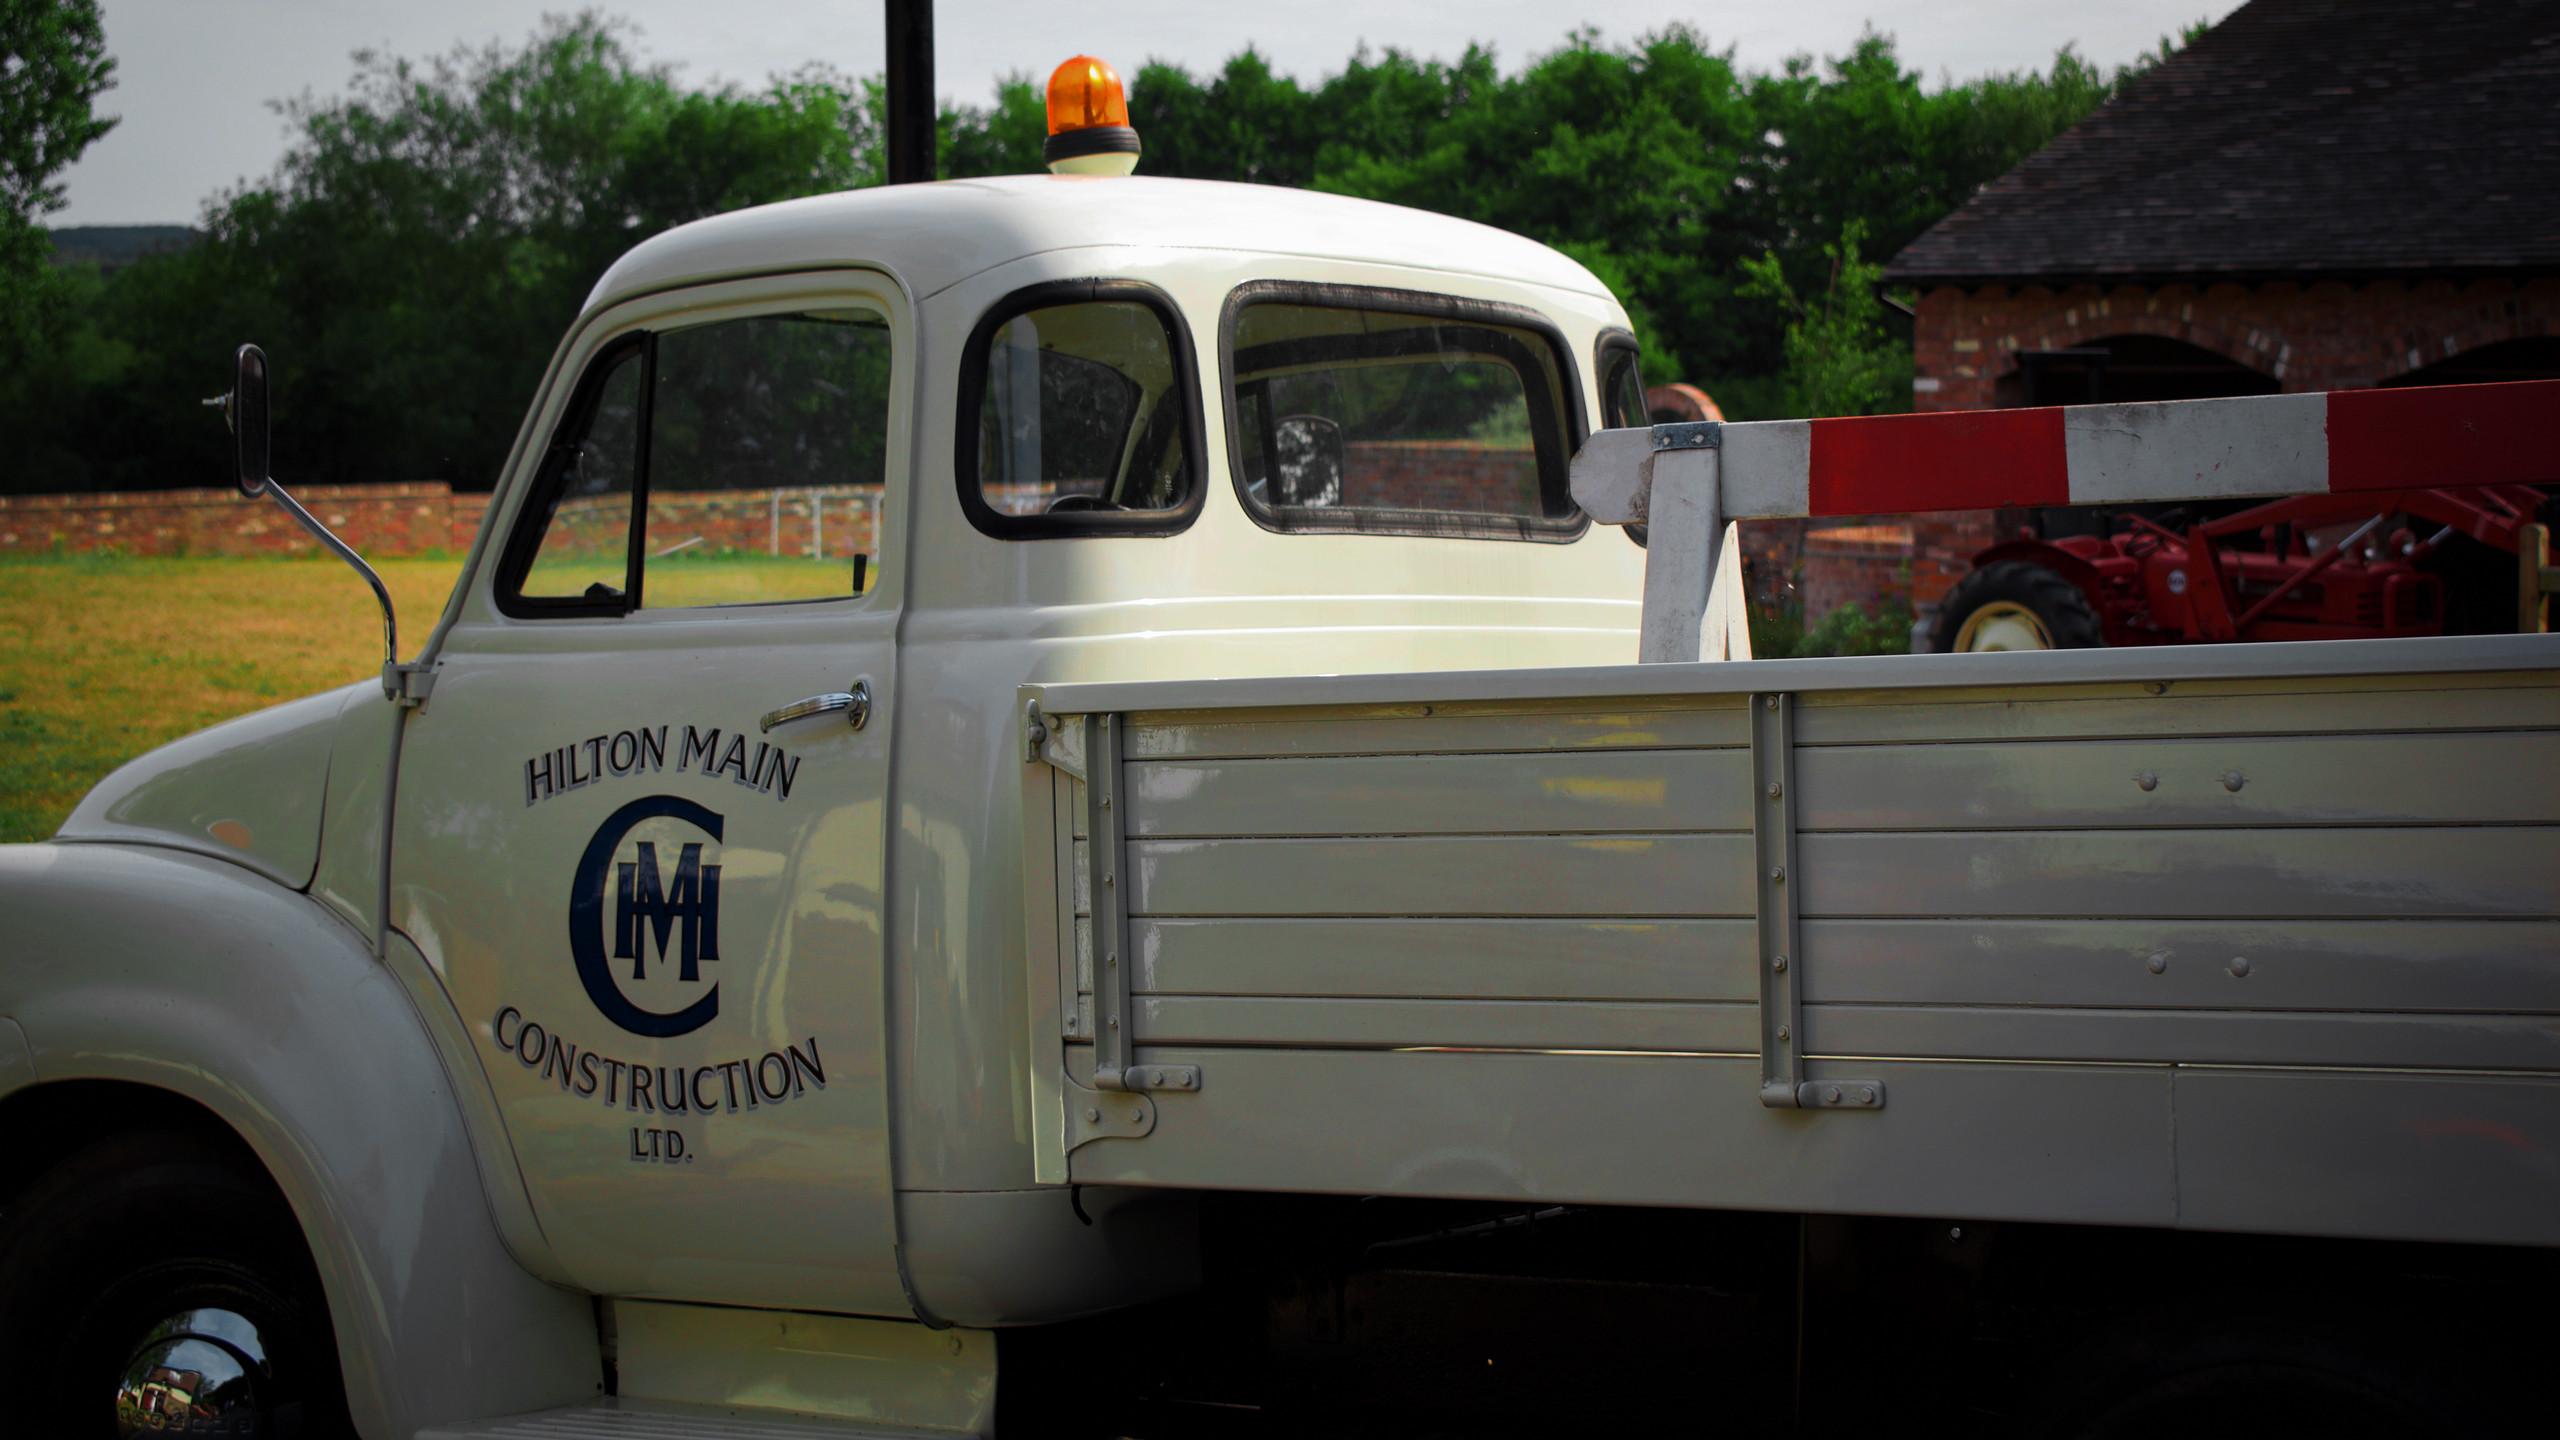 Hilton Main Construction West Midlands prized Bedford truck